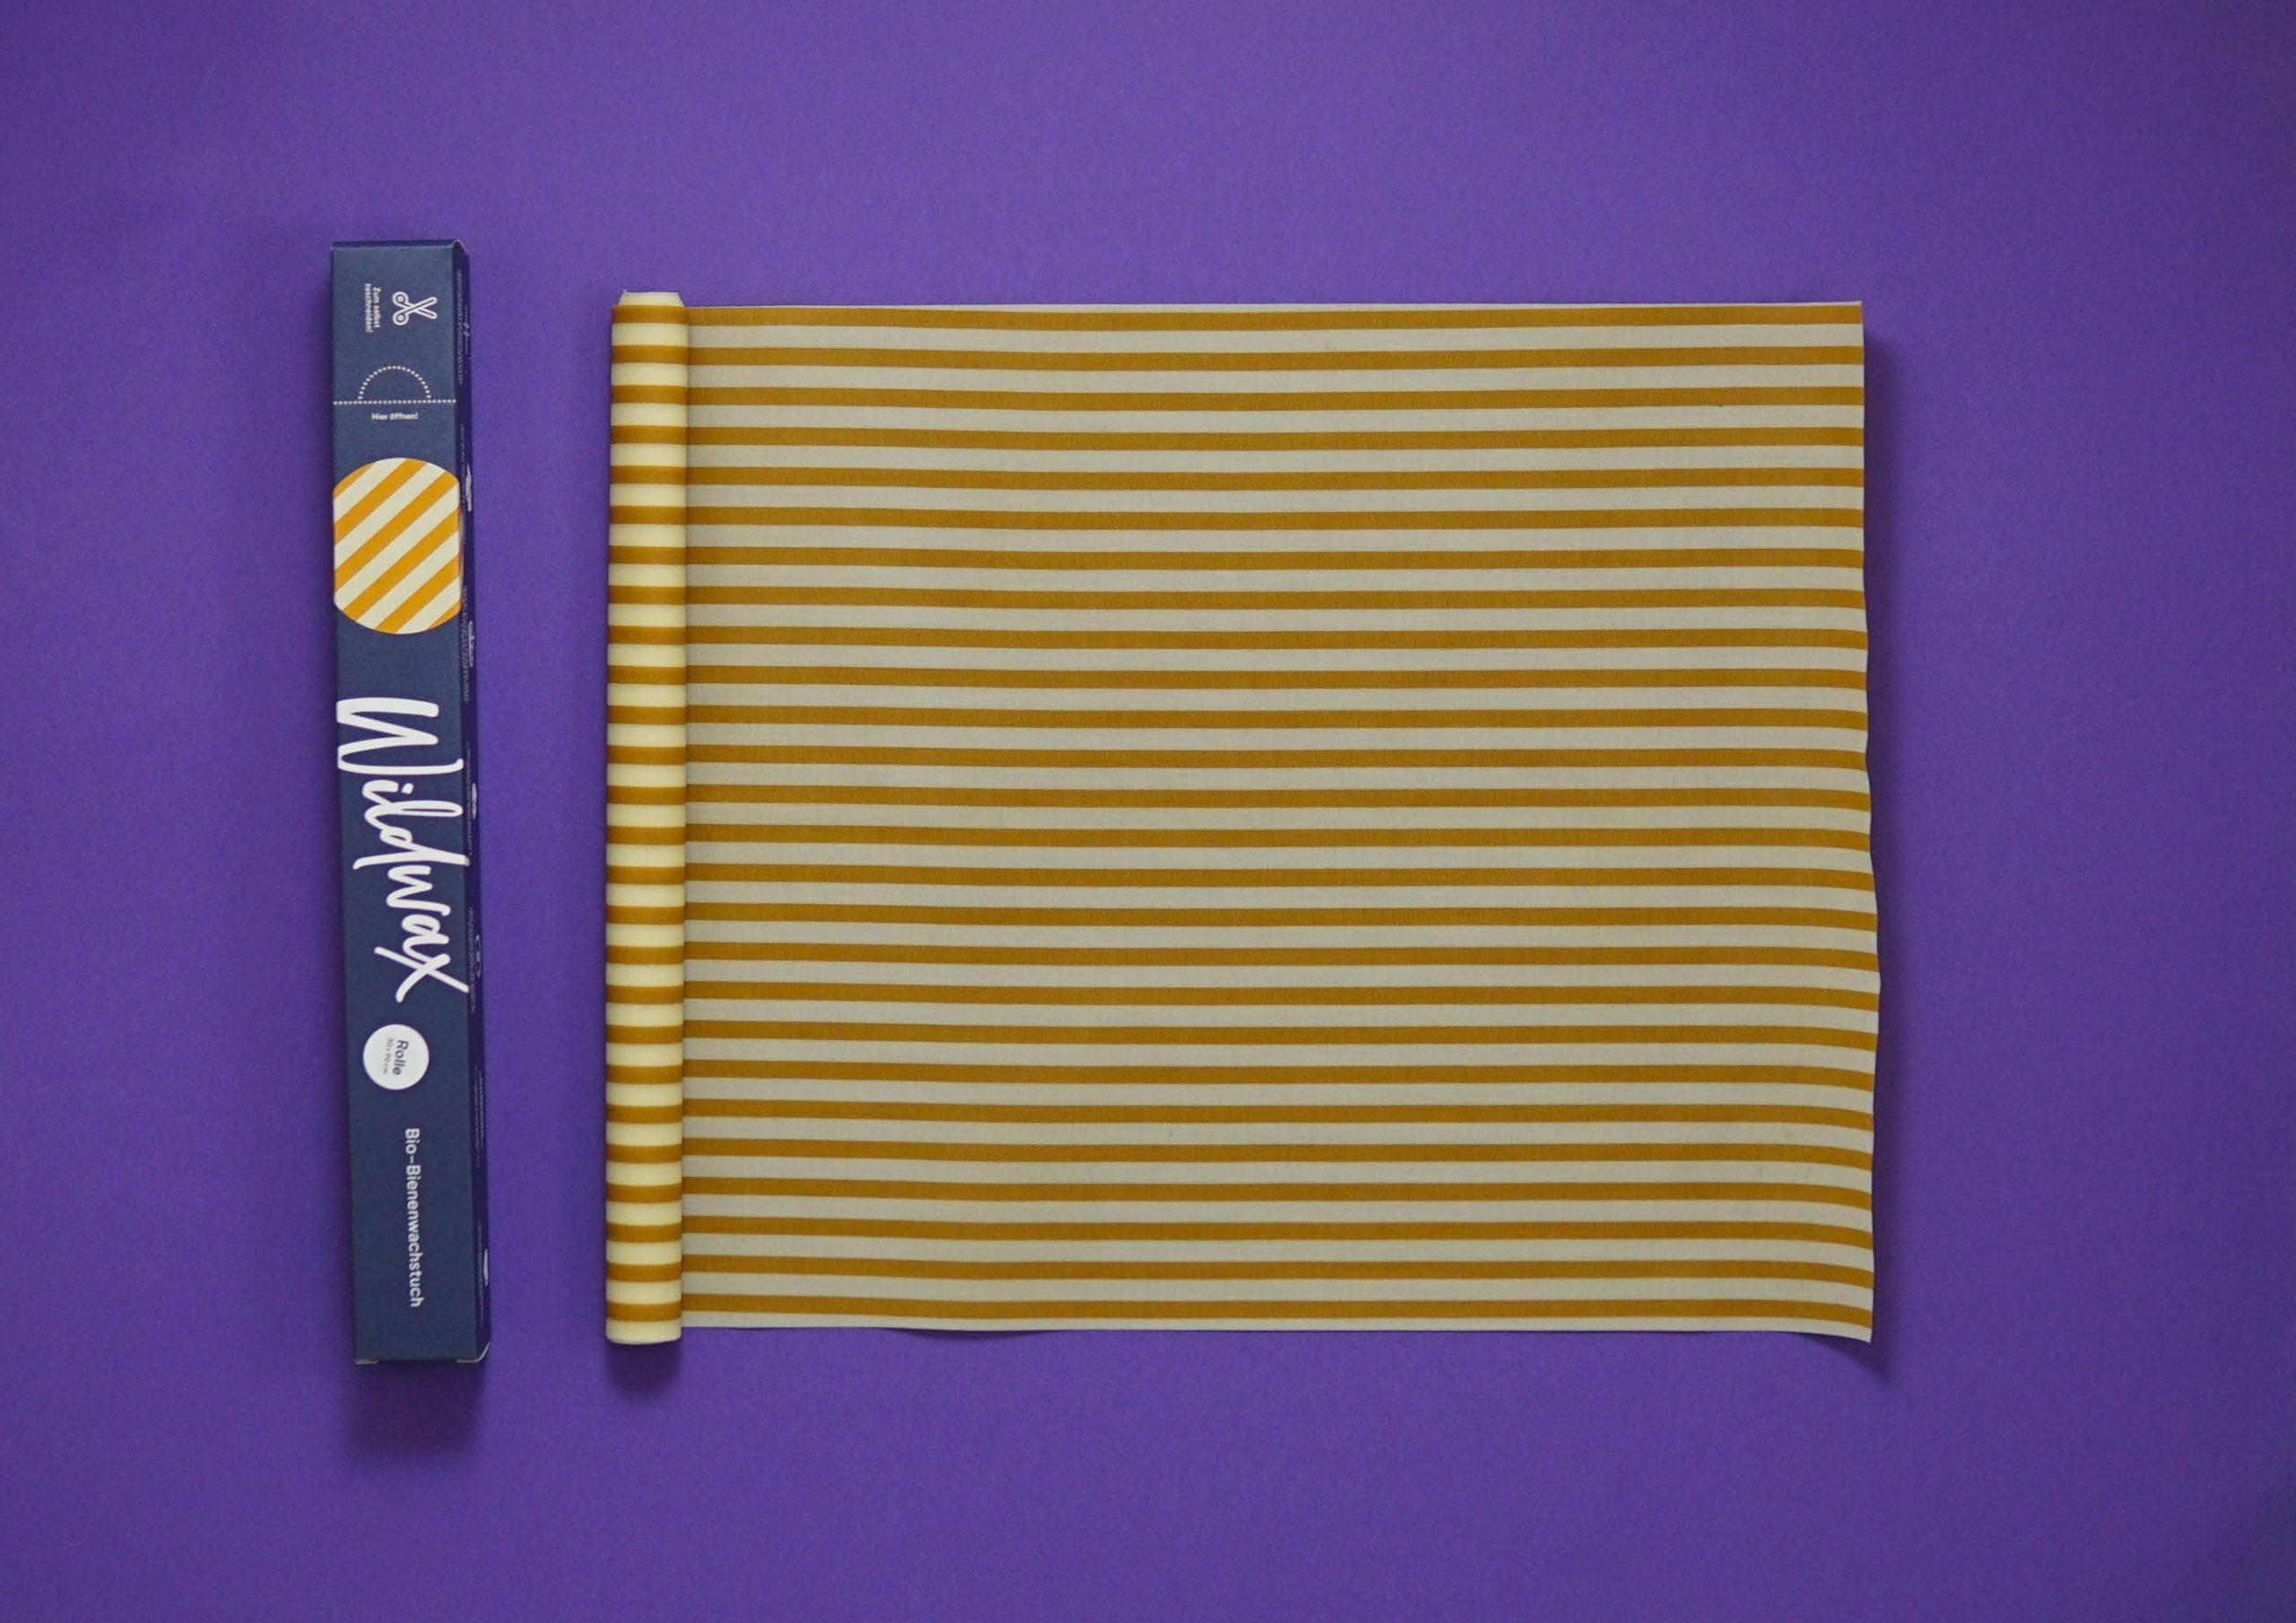 Wildwax Rolle 30x90 cm, Bienenwachstücher, versch. Designs